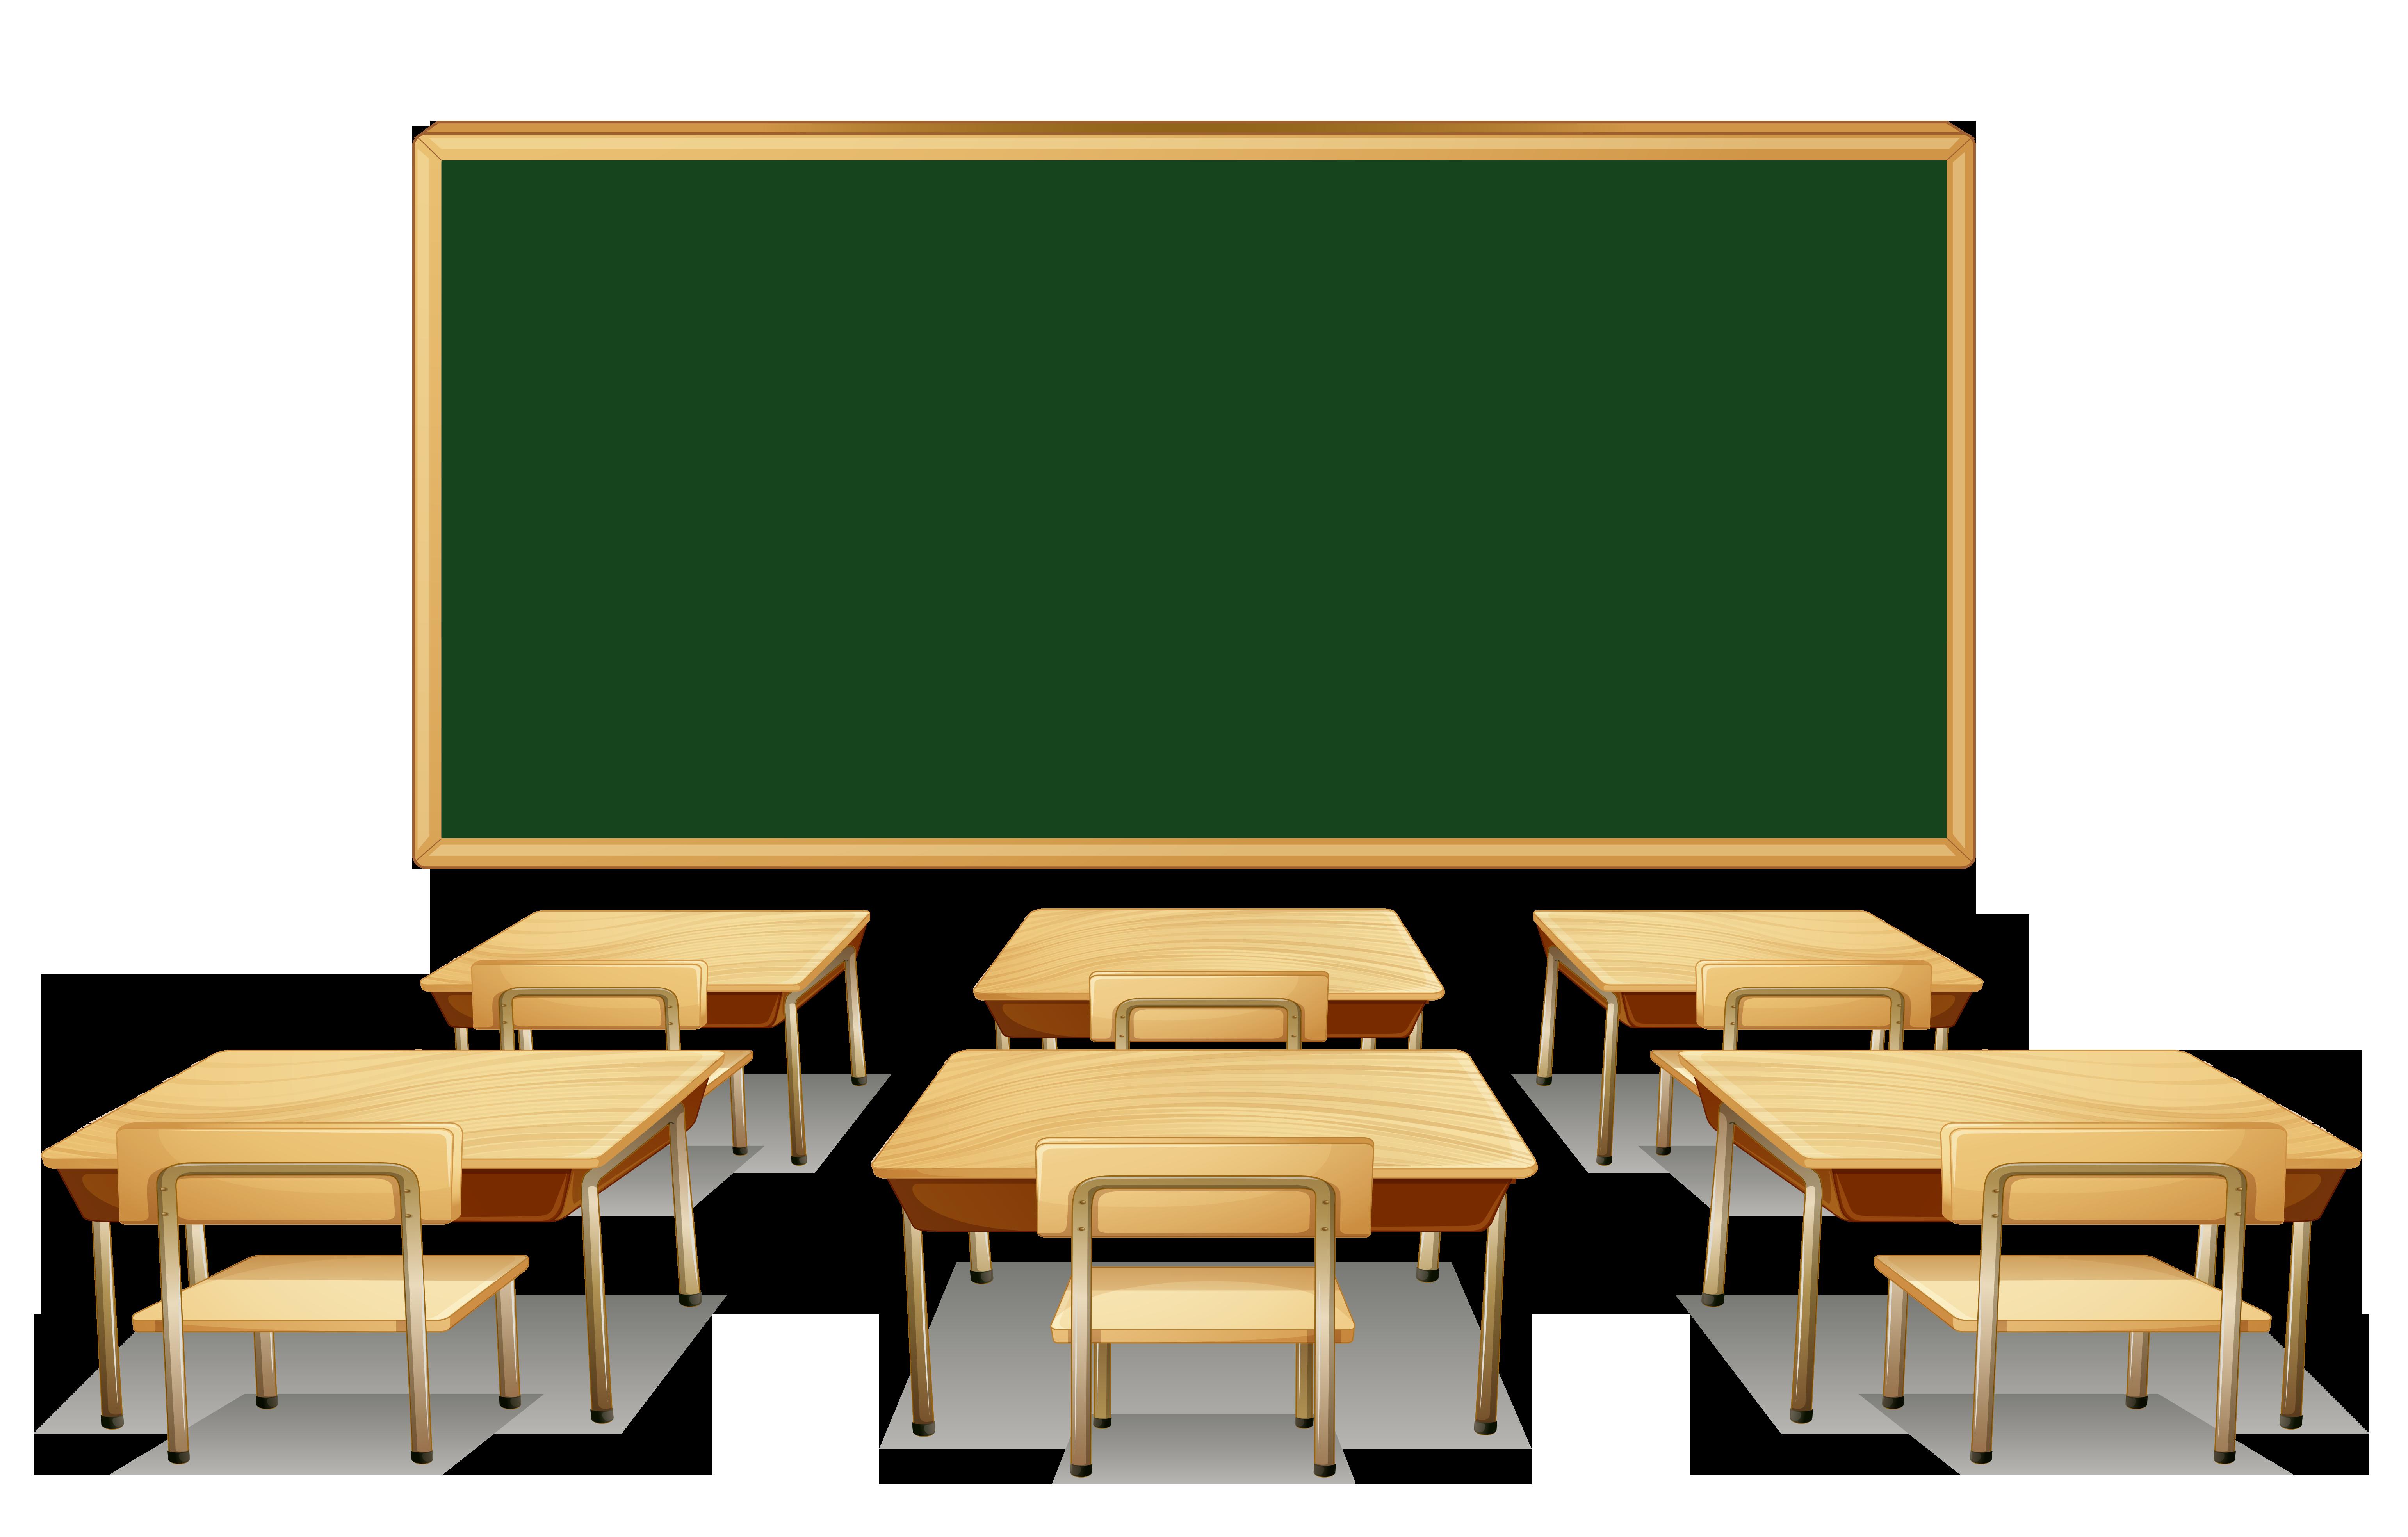 free classroom clipart-free classroom clipart-12